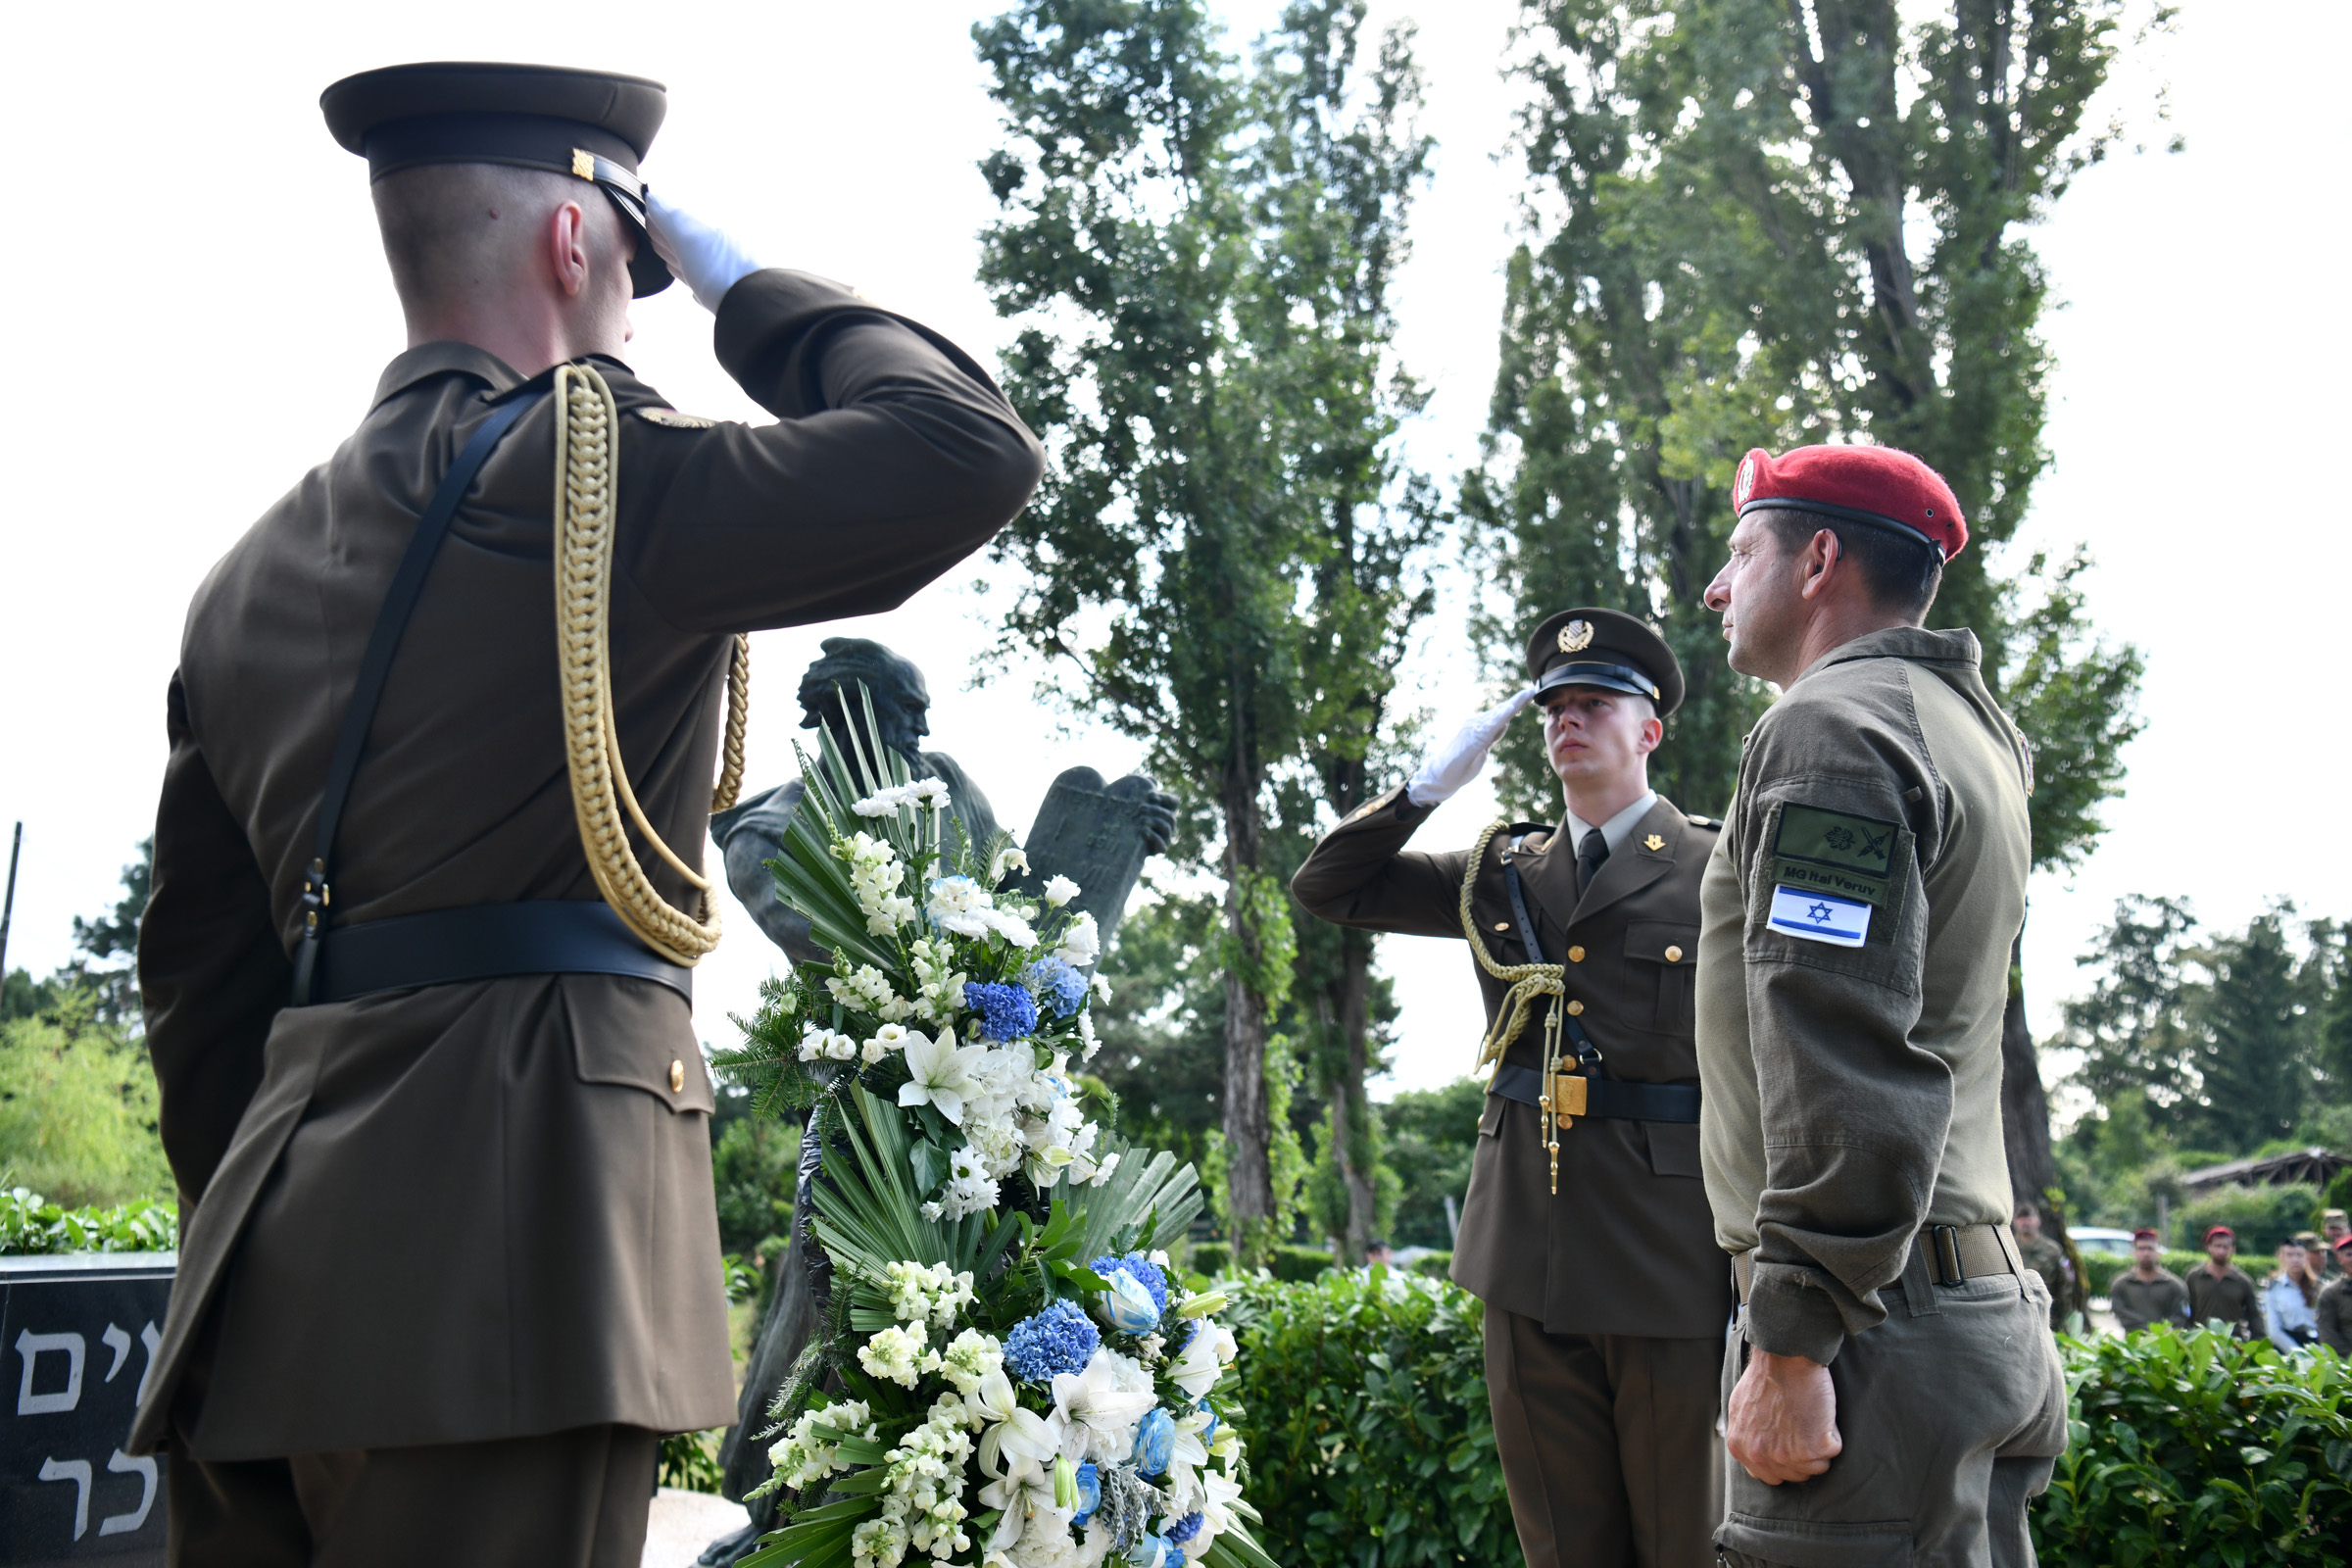 Memorijalna hodnja Izraelskih obrambenih snaga 'Operation Lightning of the Heavens' u RH